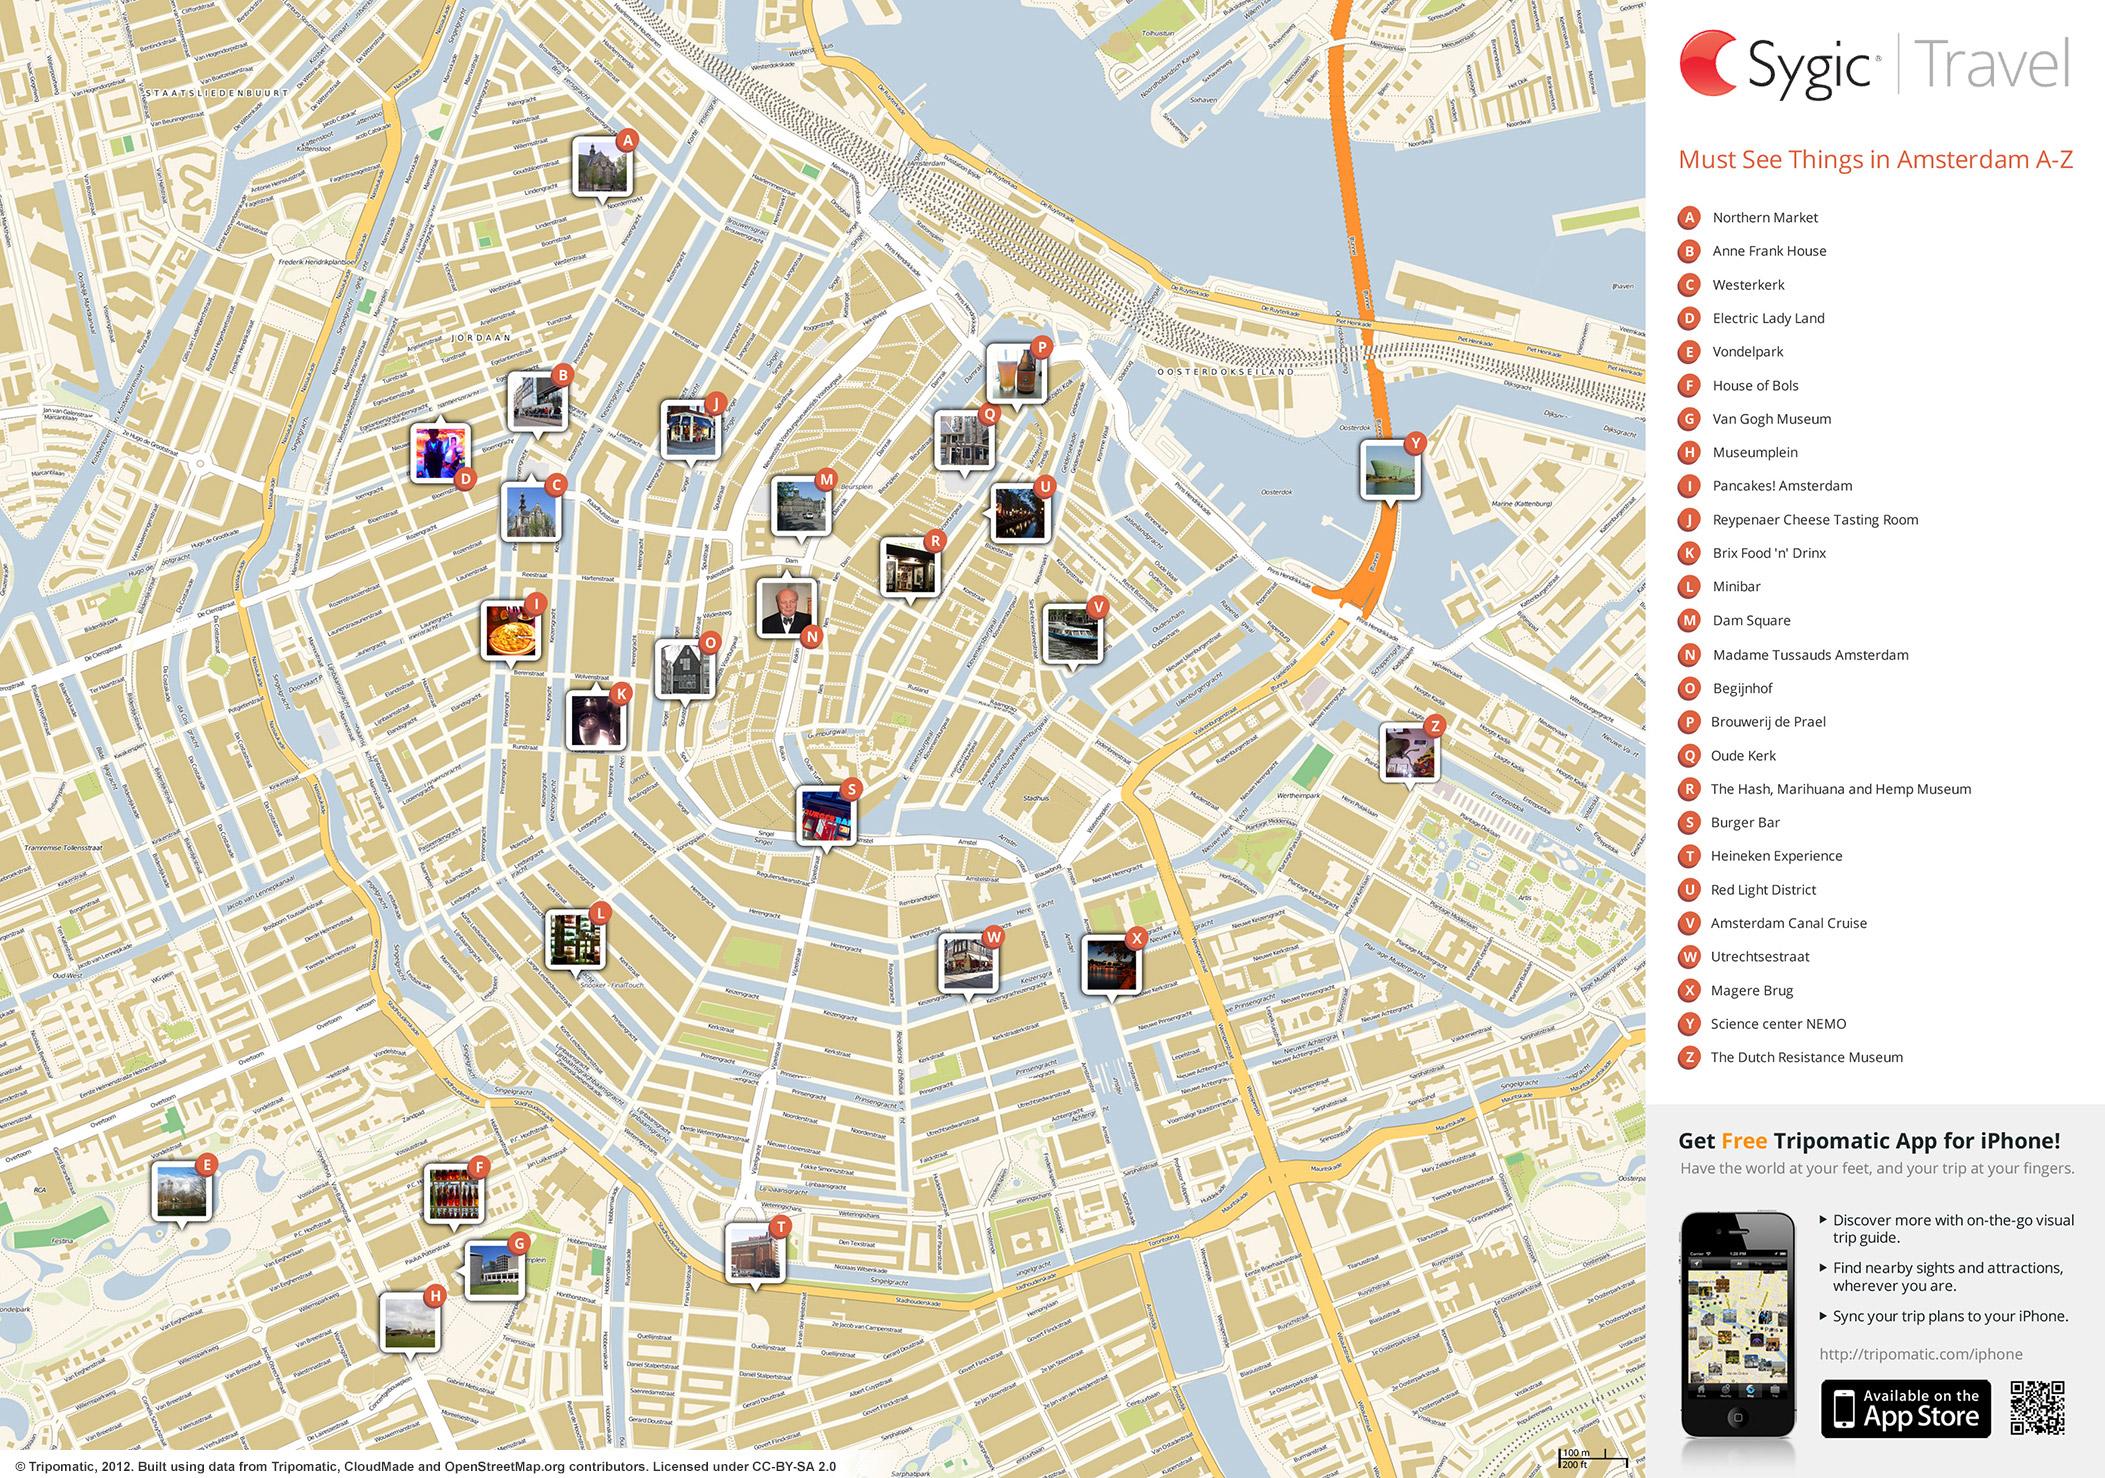 Amsterdam Tourist Map Amsterdam Printable Tourist Map | Sygic Travel